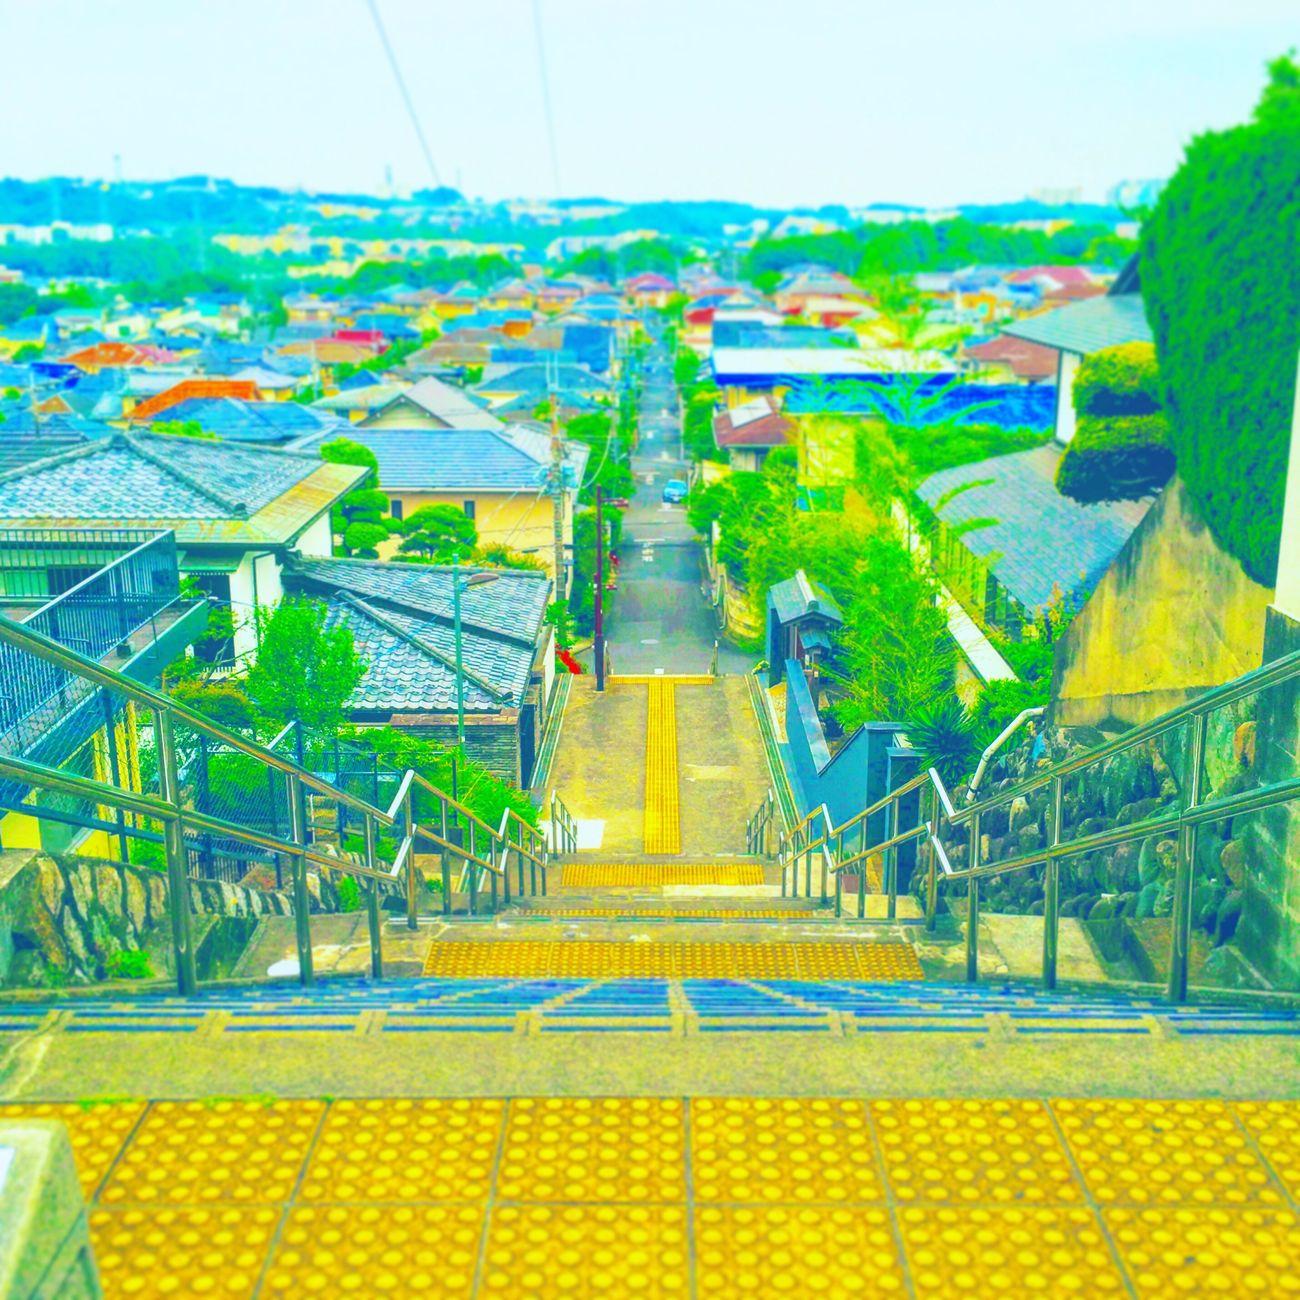 In 聖蹟桜ケ丘📍 とうきょう 聖蹟桜ケ丘 ジブリ Japanese  Japan Beutiful  映画 MOVIE Tokyo Totoro 耳をすませば